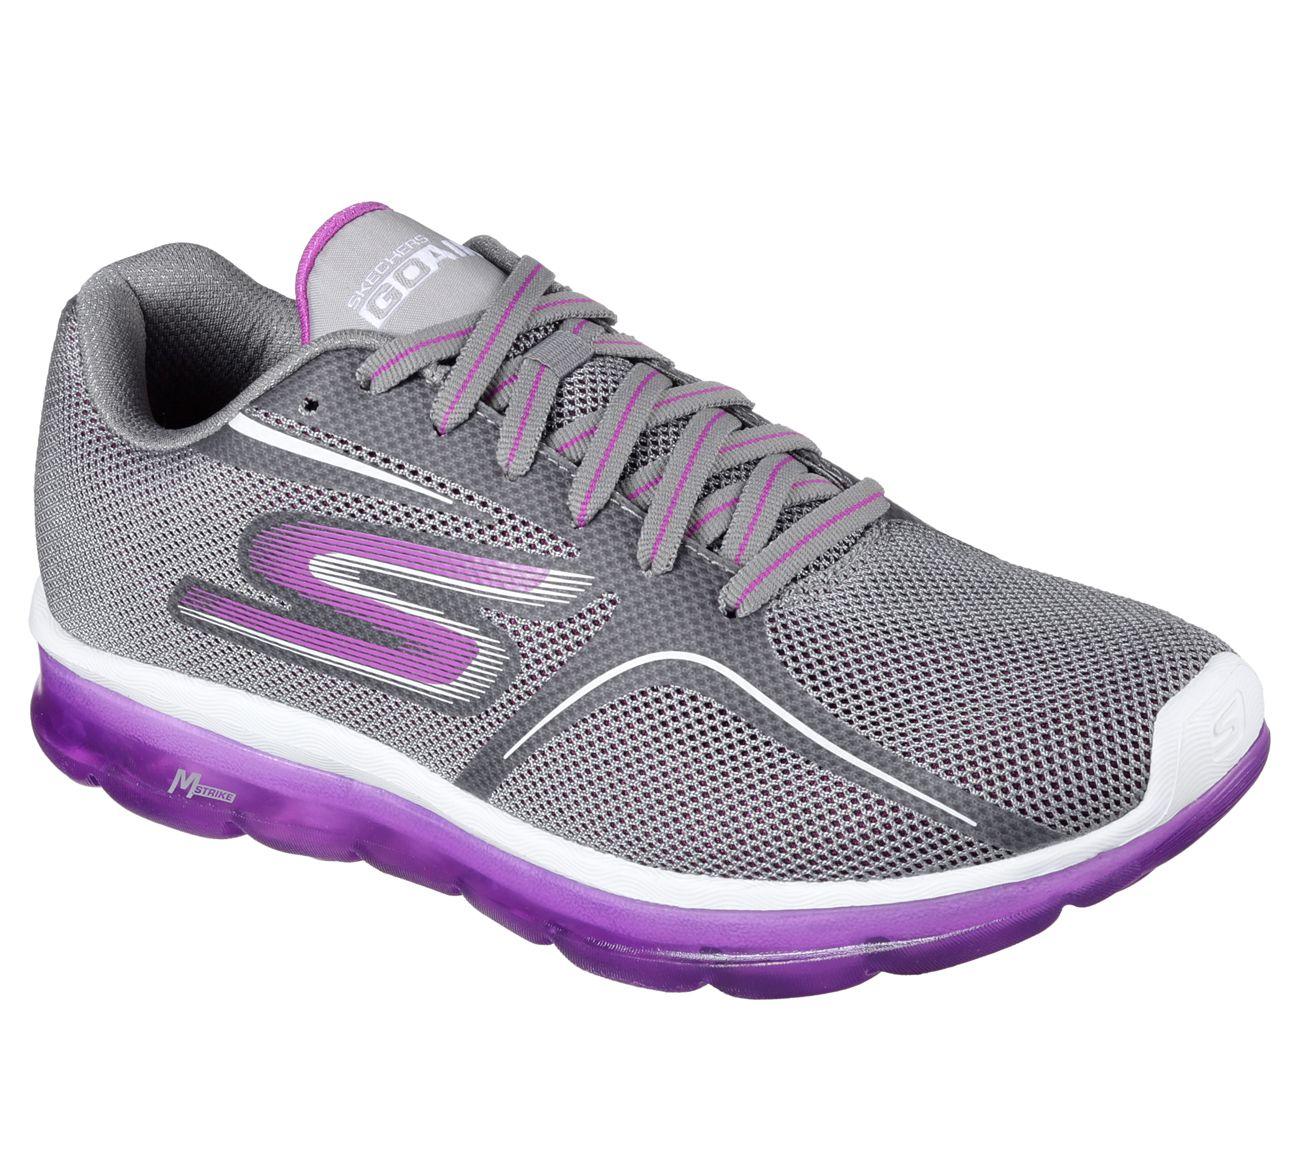 Skechers shoes